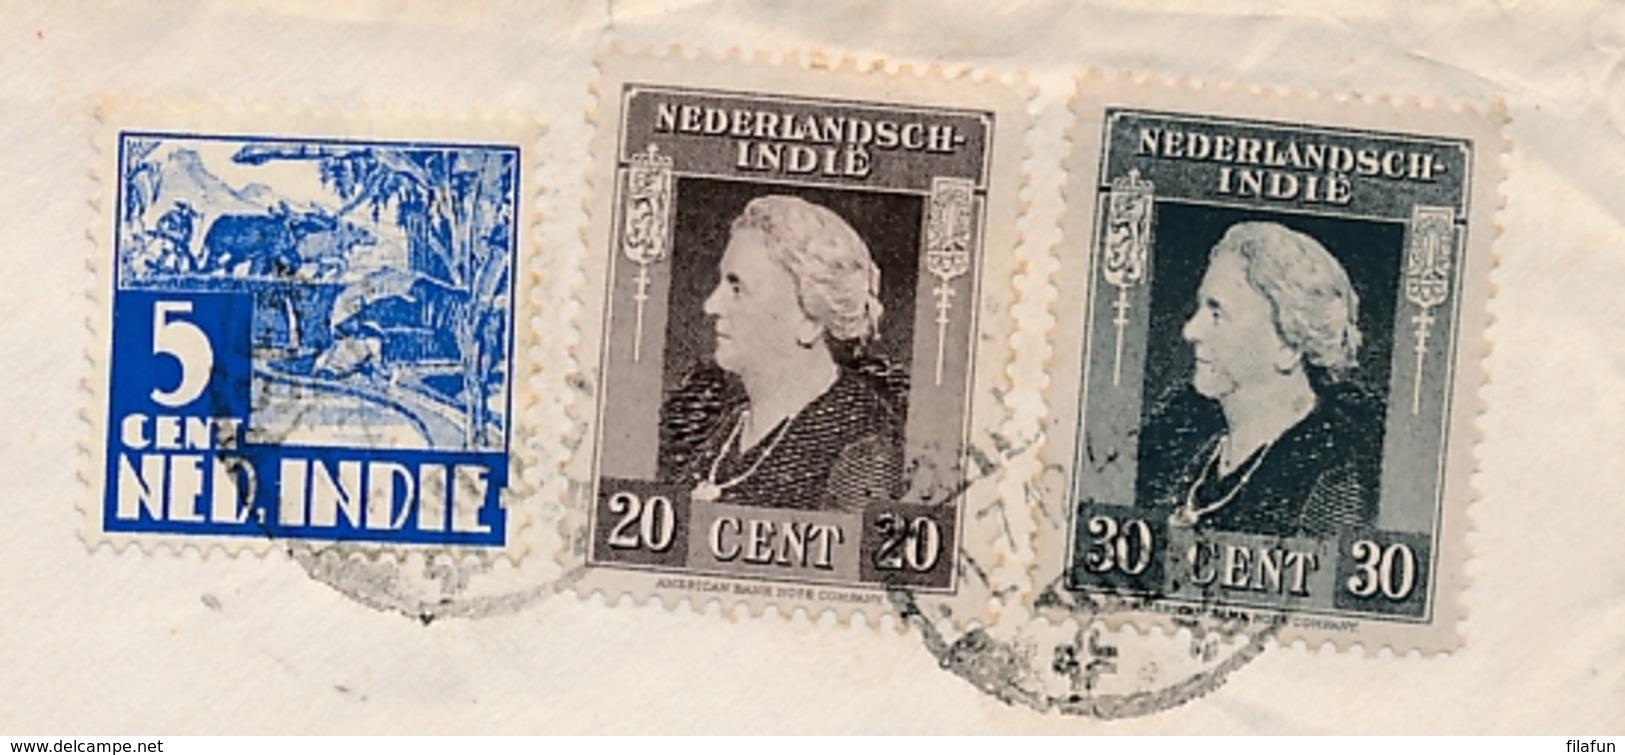 Nederlands Indië - 1948 - 55 Cent Frankering Op Brief Van Nederlandse Militair Van Semarang Naar Amsterdam - Nederlands-Indië